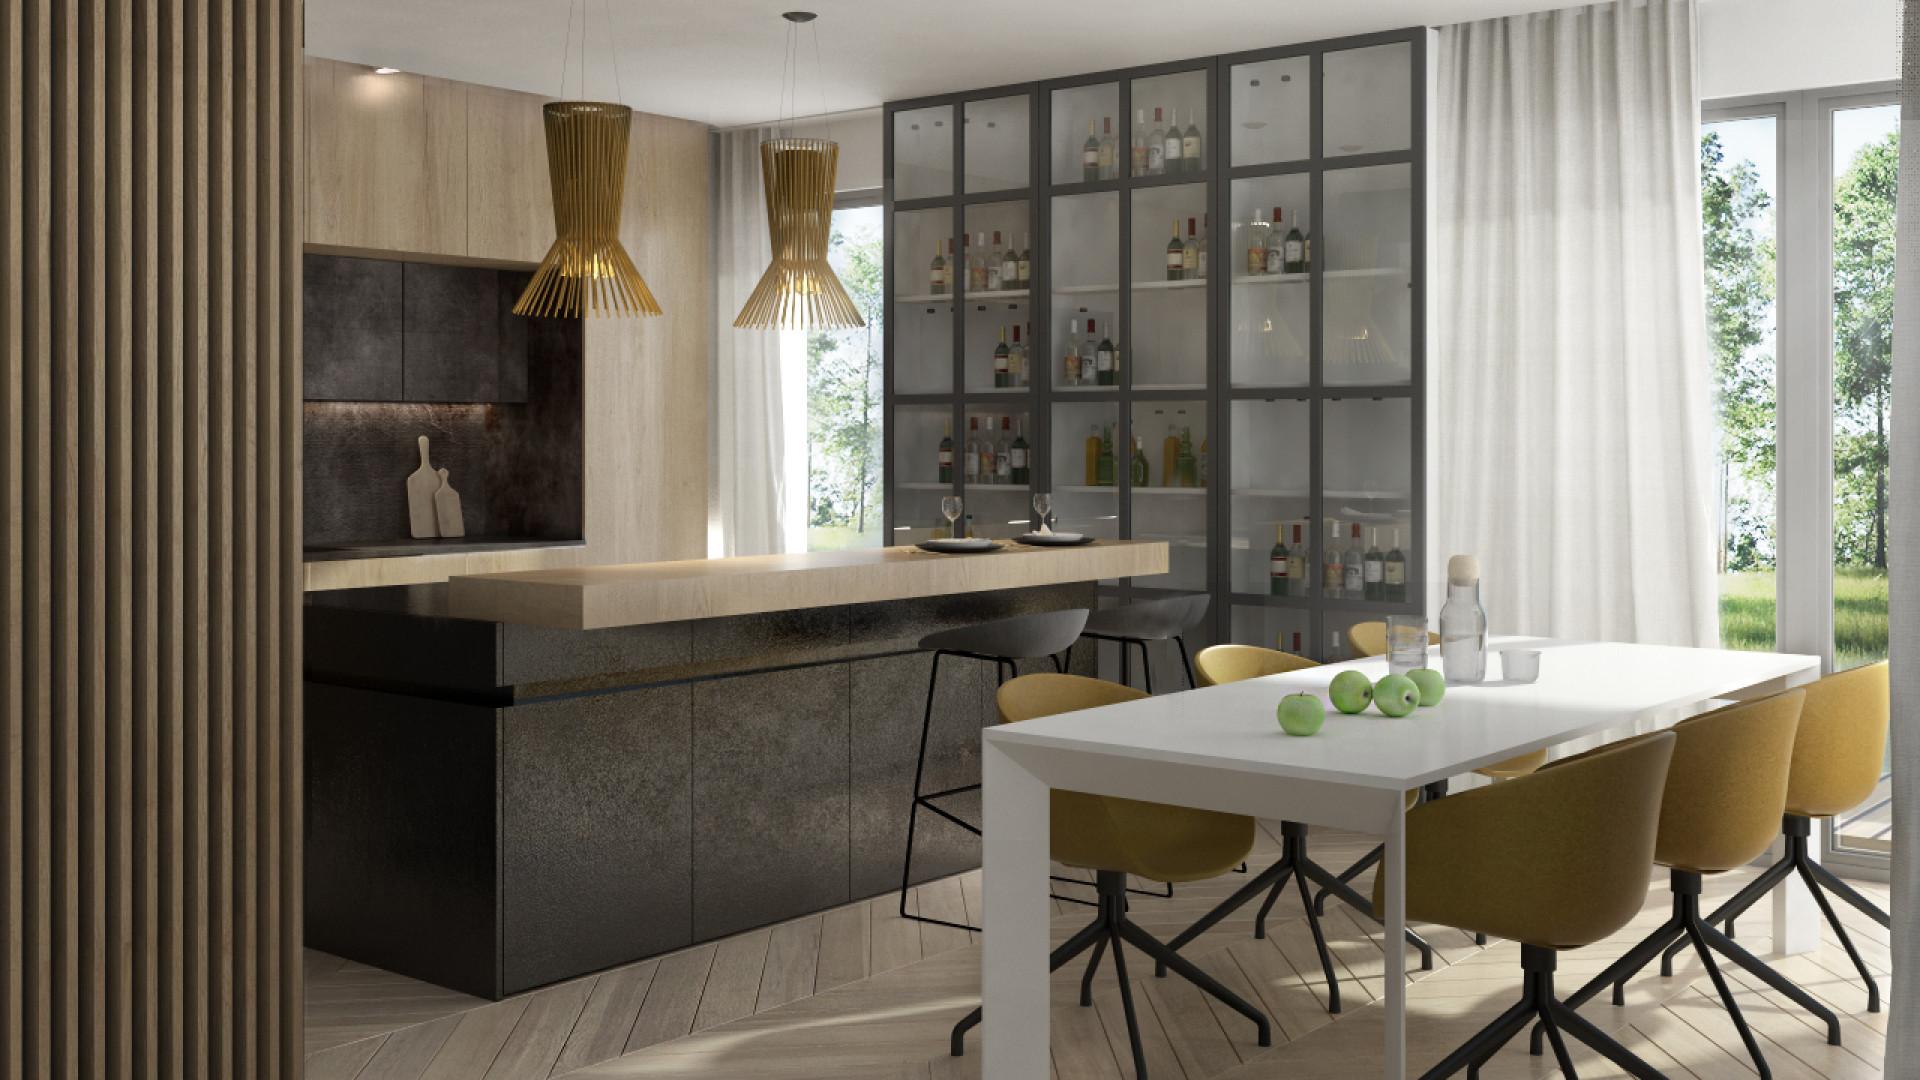 Wnętrze Corner House (kuchnia). Projekt: 3DProjekt. Fot. 3DProjekt